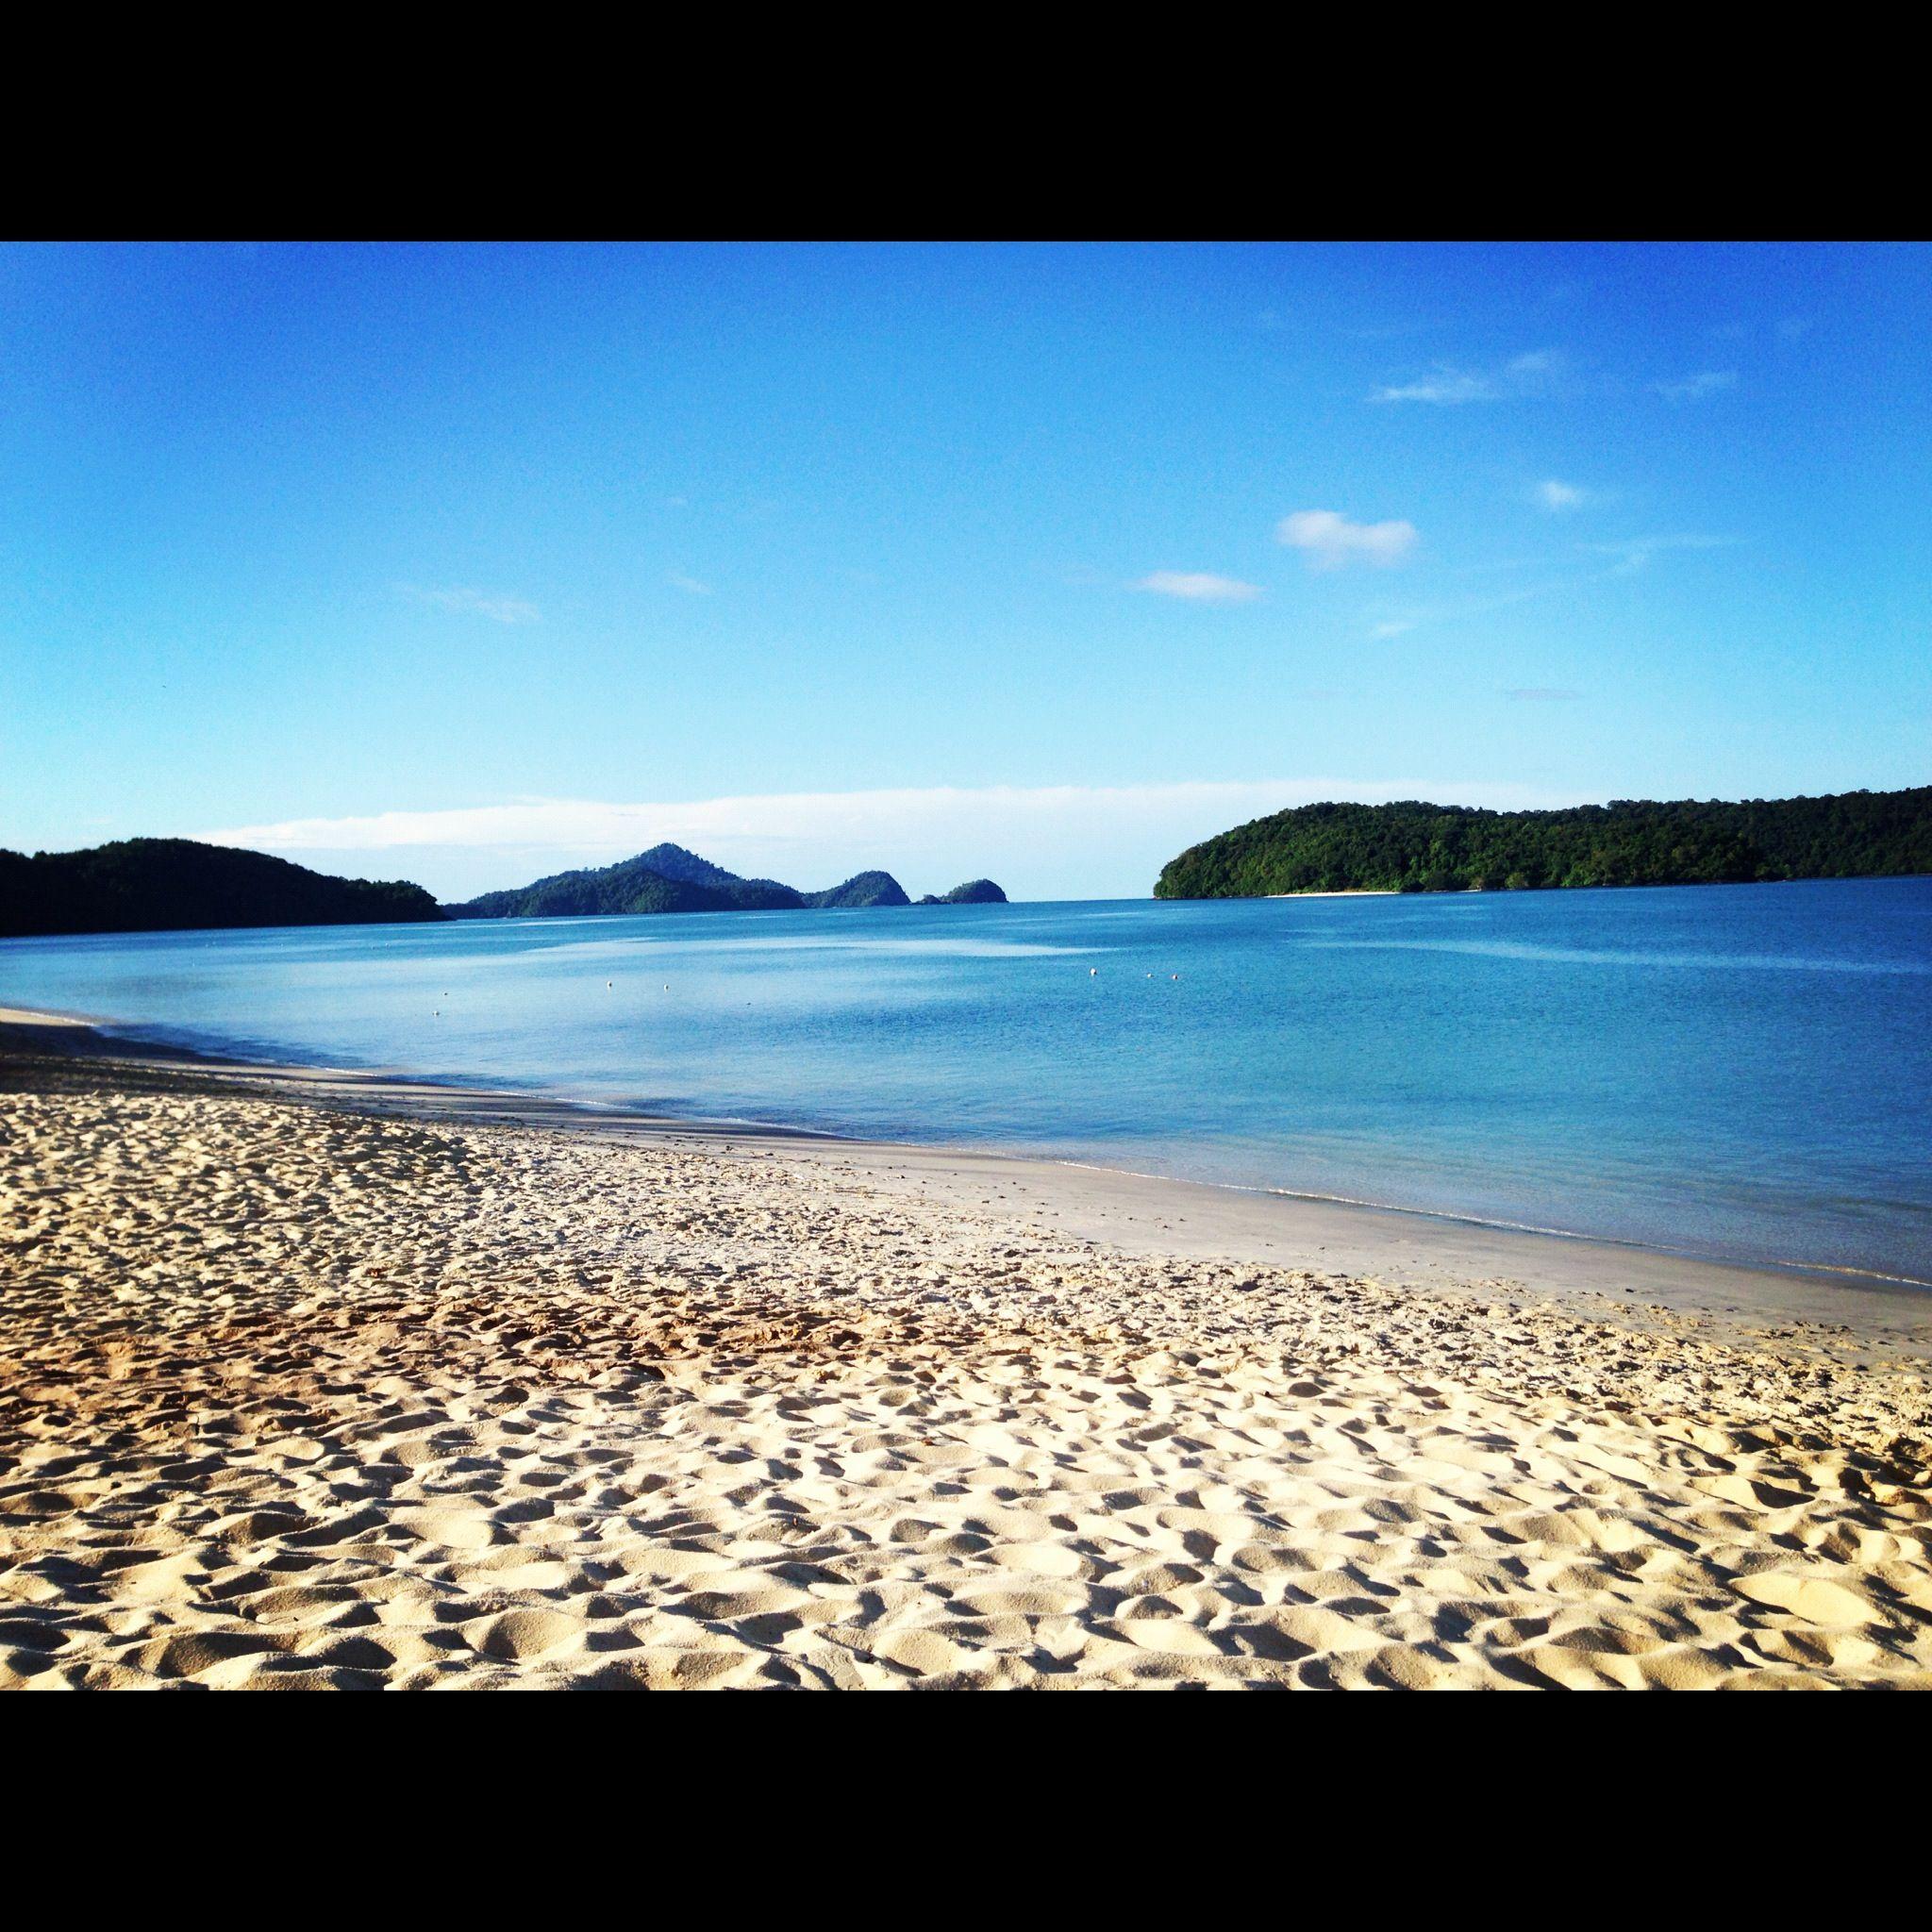 Malaysia Beaches: Cenang Beach, Langkawi, Malaysia.